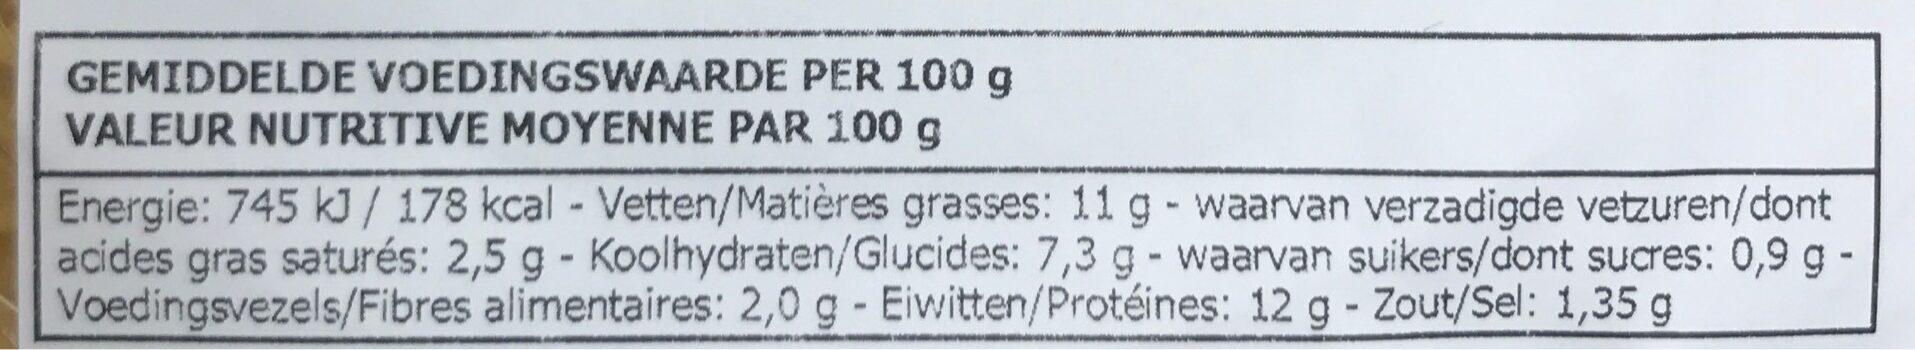 Croq' Poulet Fromage-jambon-crème - Voedingswaarden